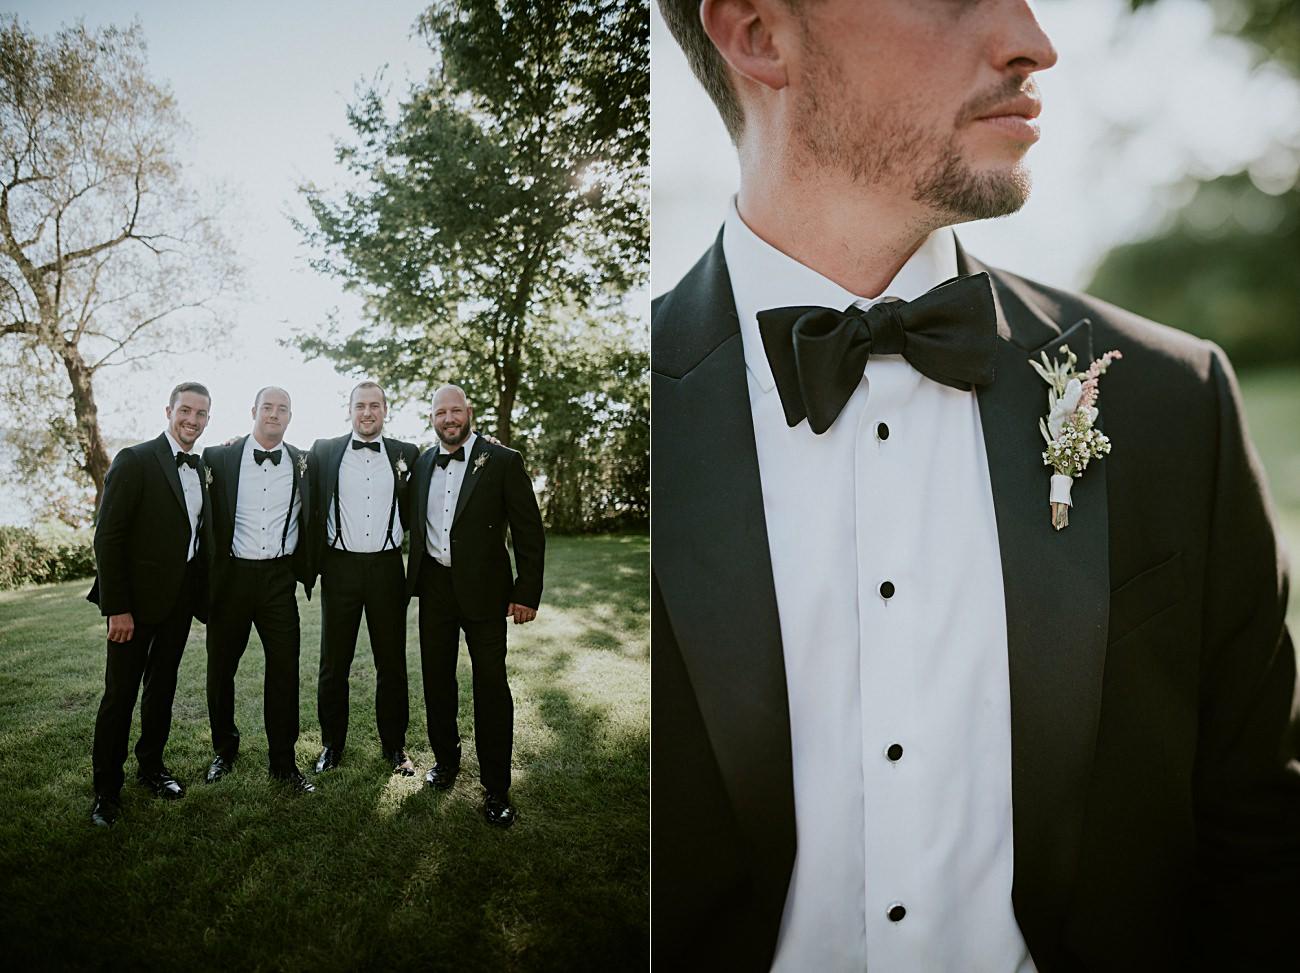 black tie wedding - Lakeside wedding in Green Lake Wisconsin -Heidel House Wedding - Green Lake Wisconsin Wedding